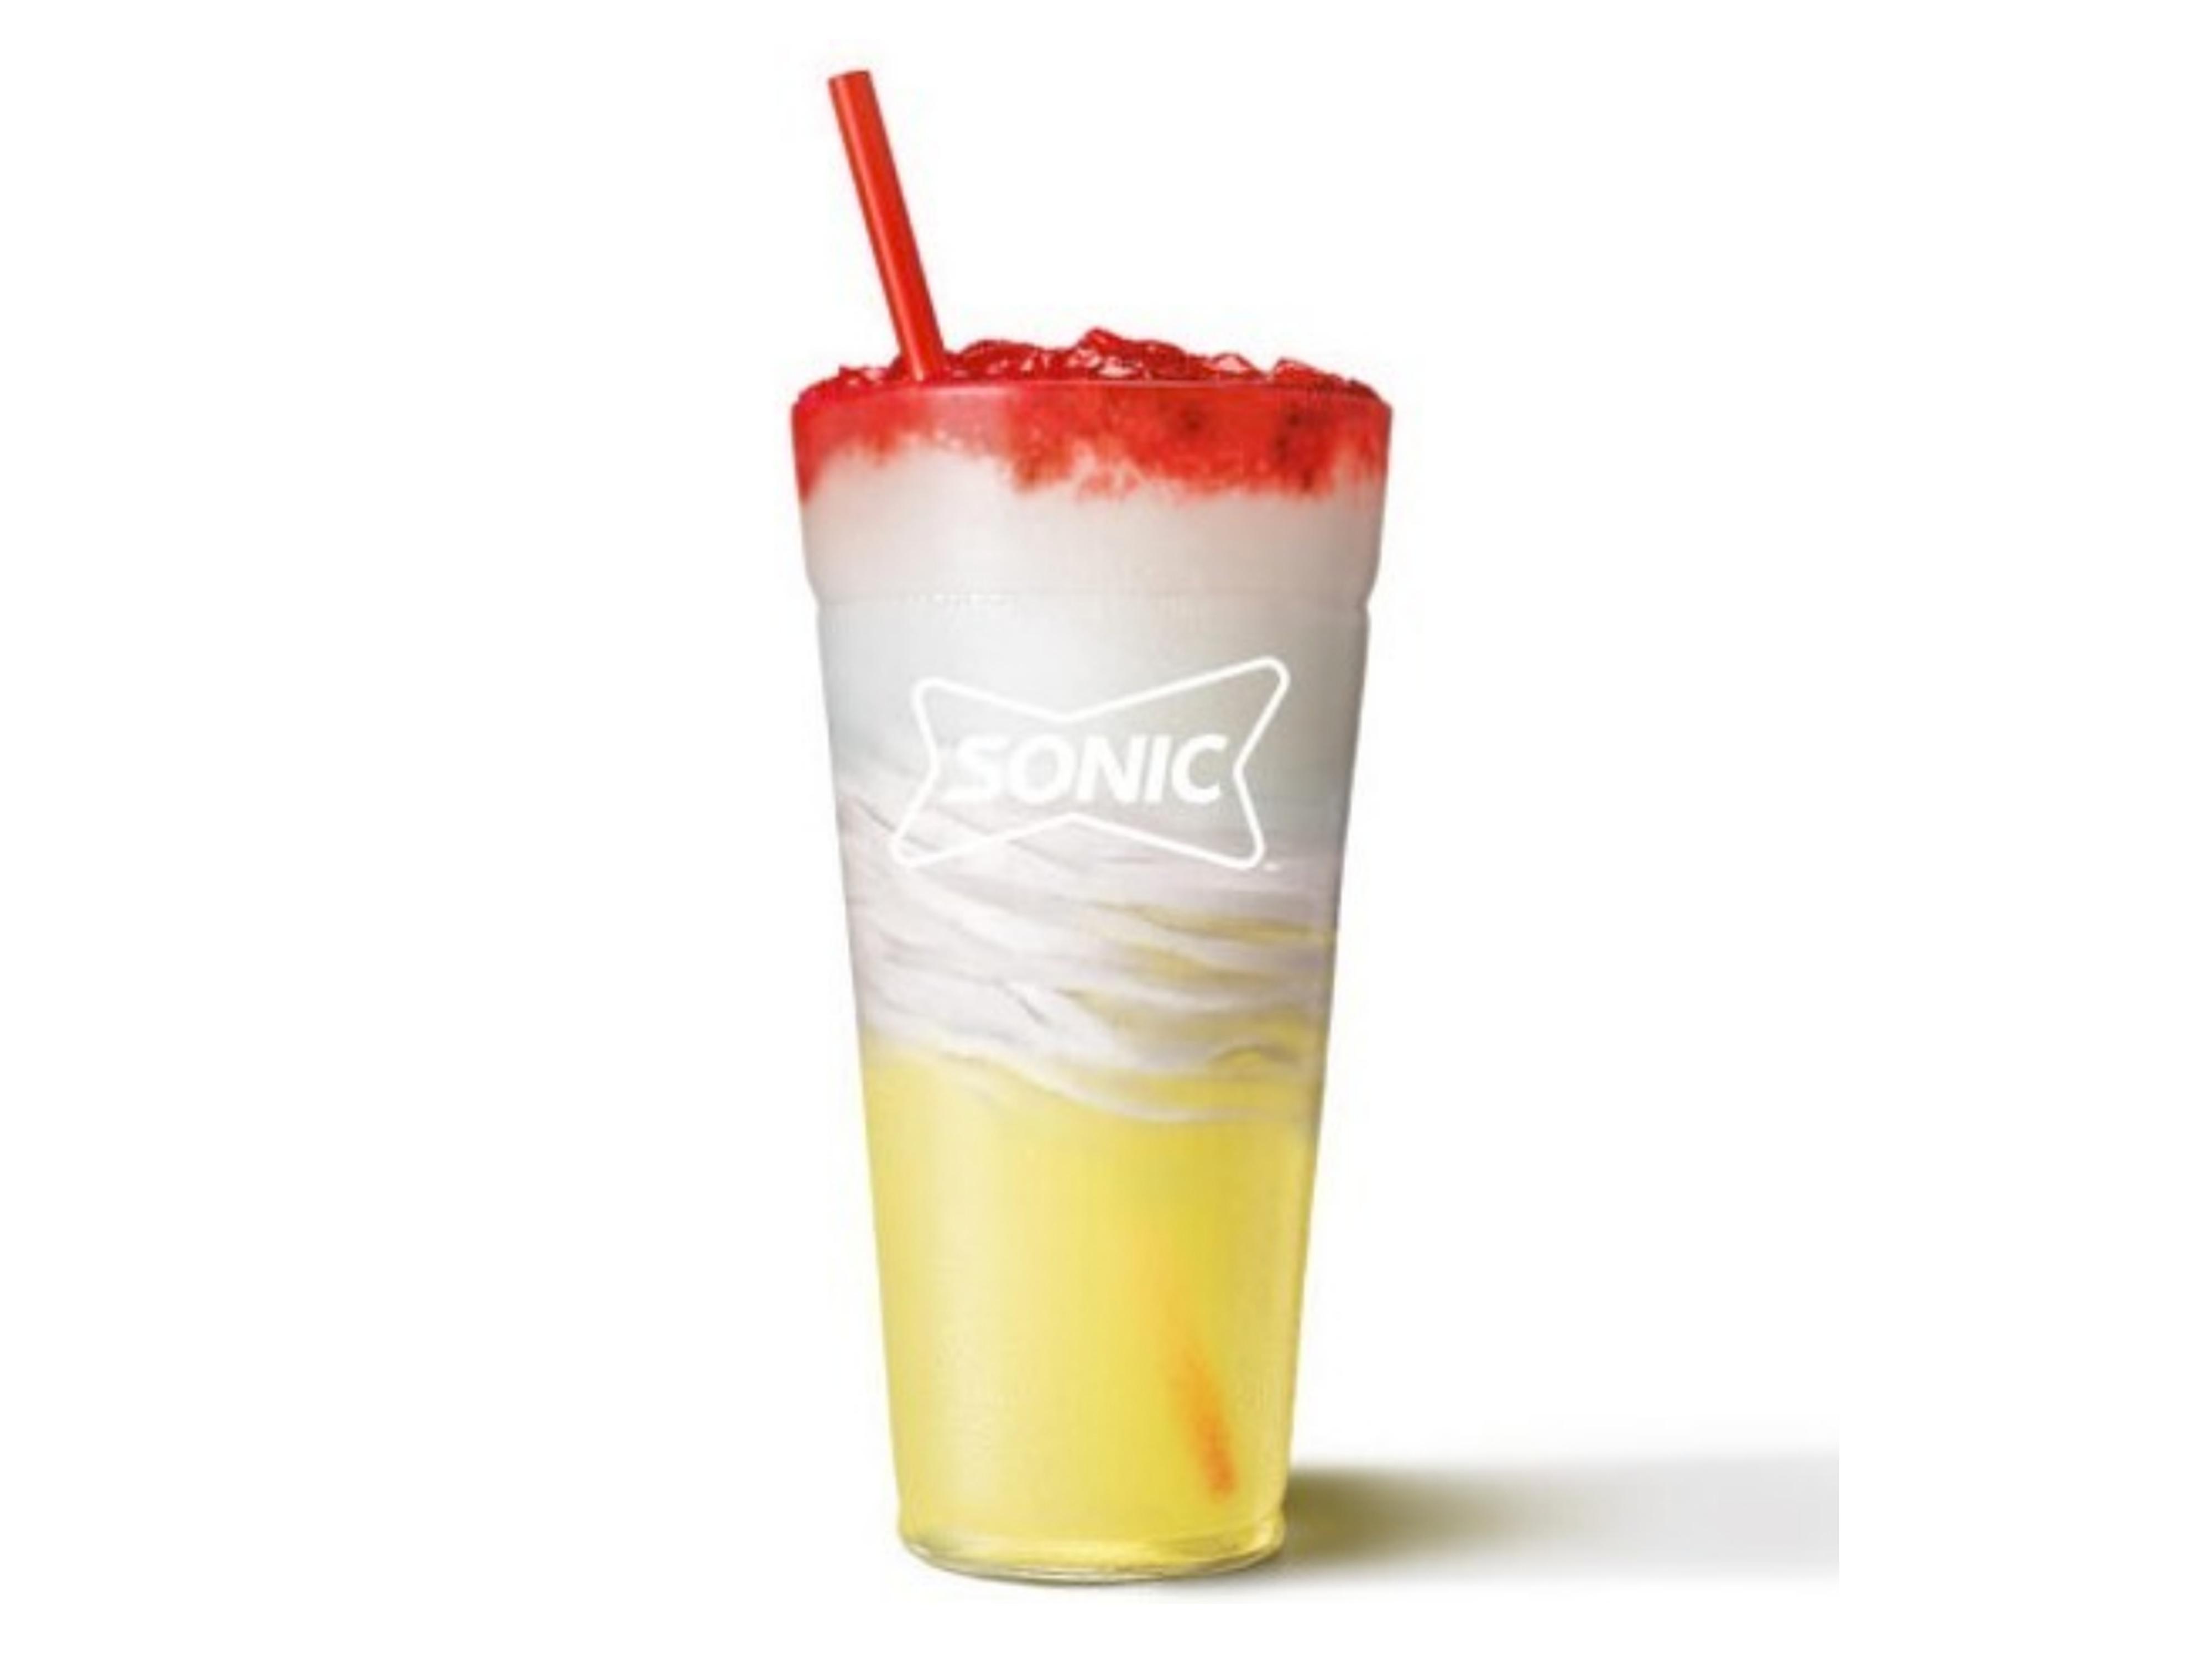 sonic-lemonberry-slush-float